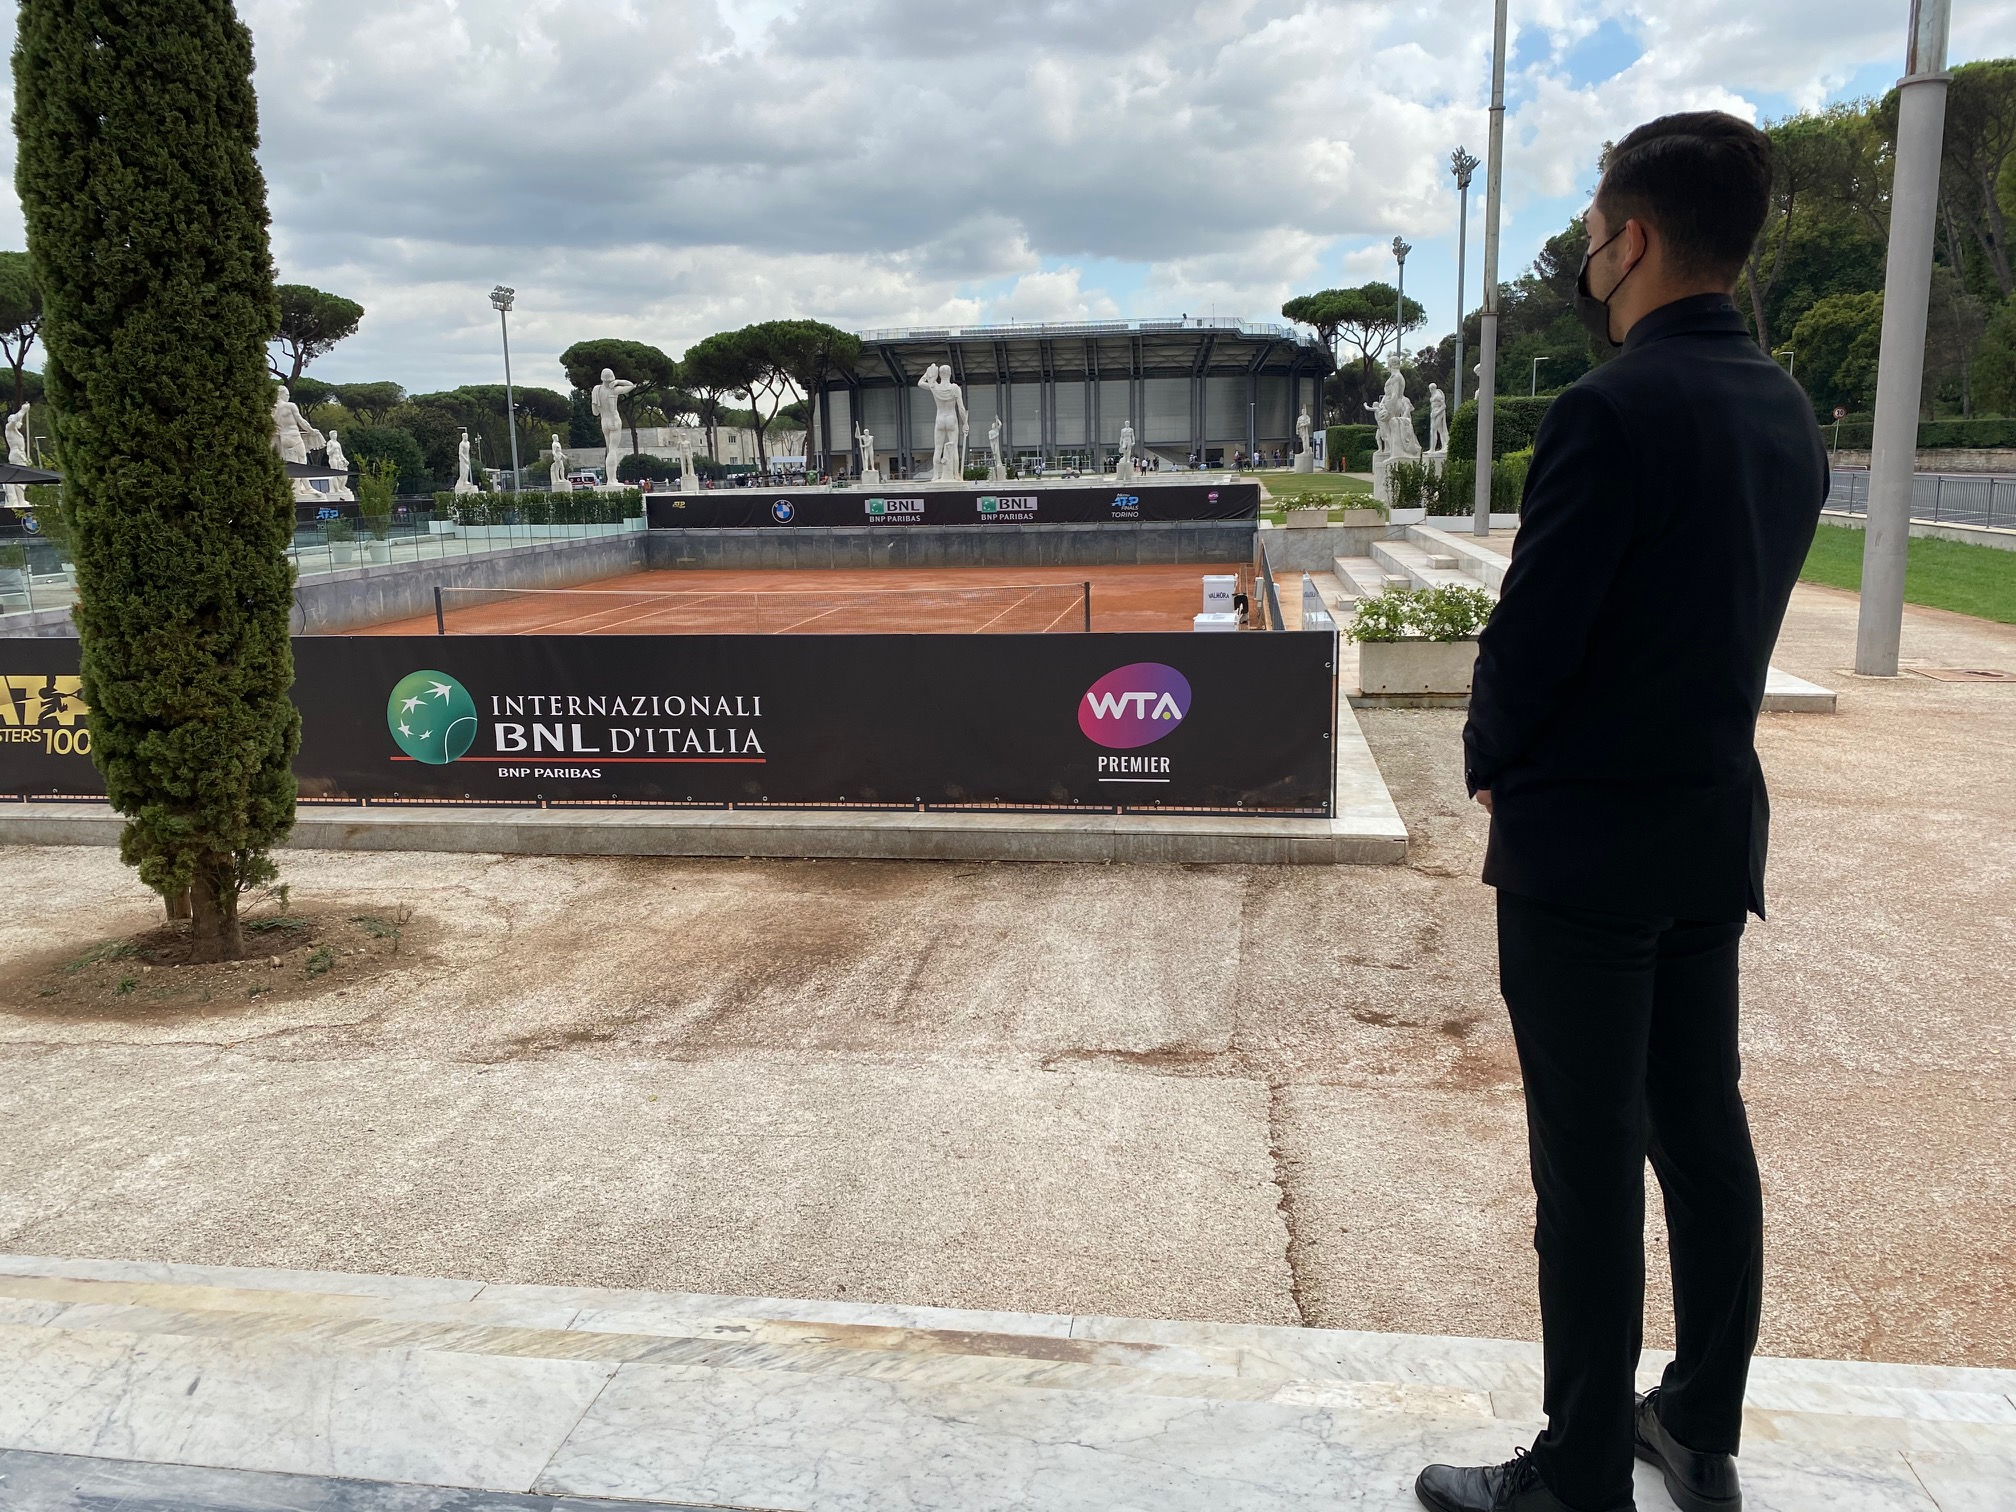 Internazionali BNL d'Italia – Roma